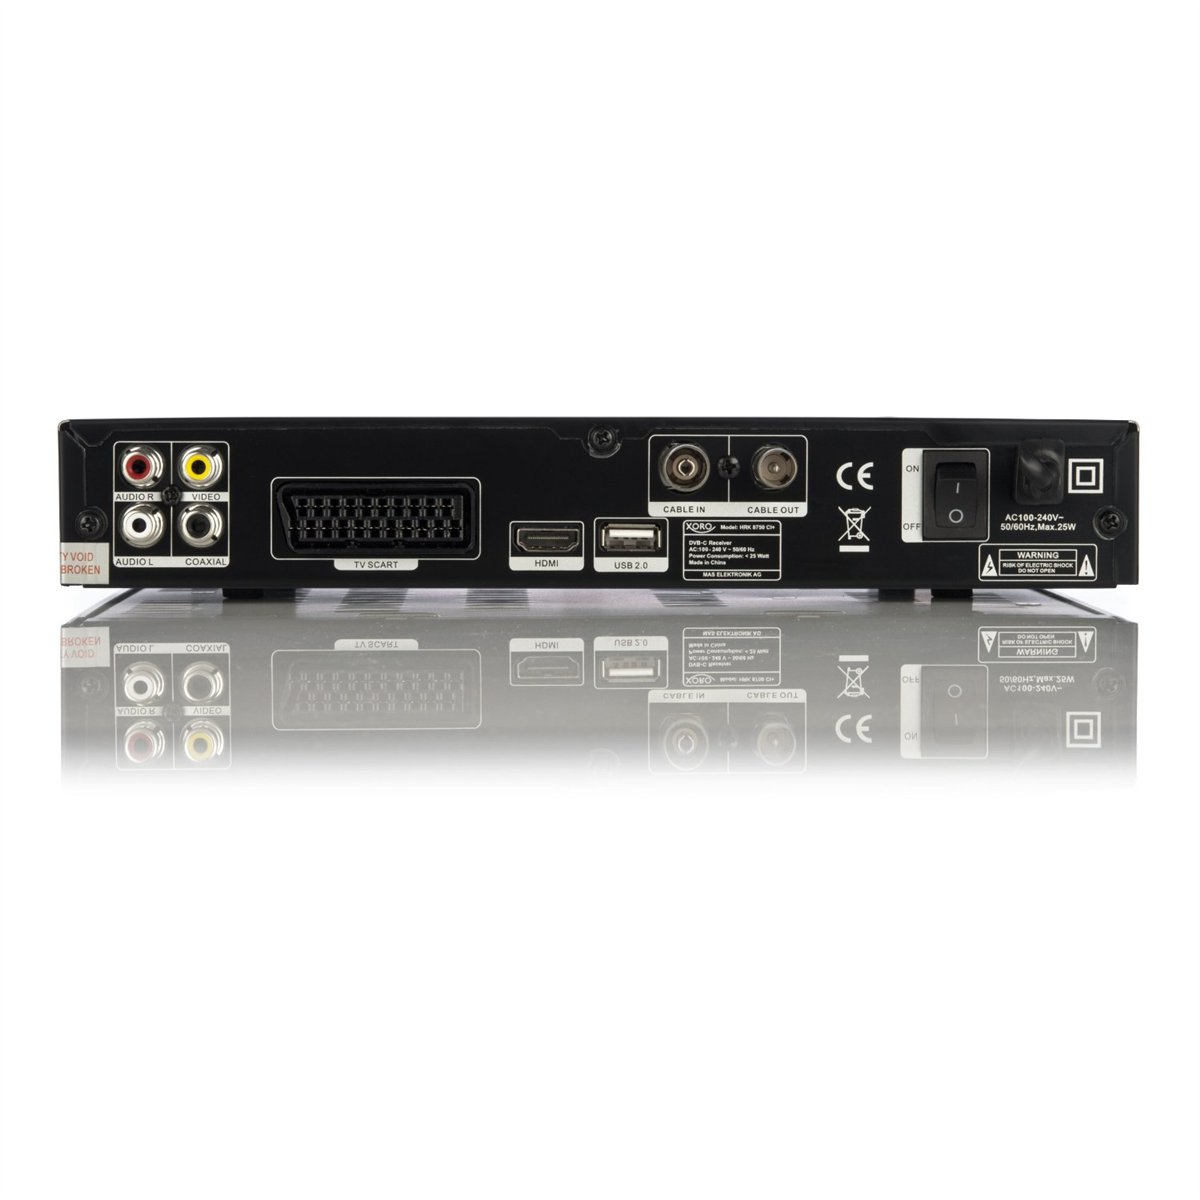 xoro hrk 8750 ci dvb c full hd kabel receiver hdtv hdmi. Black Bedroom Furniture Sets. Home Design Ideas